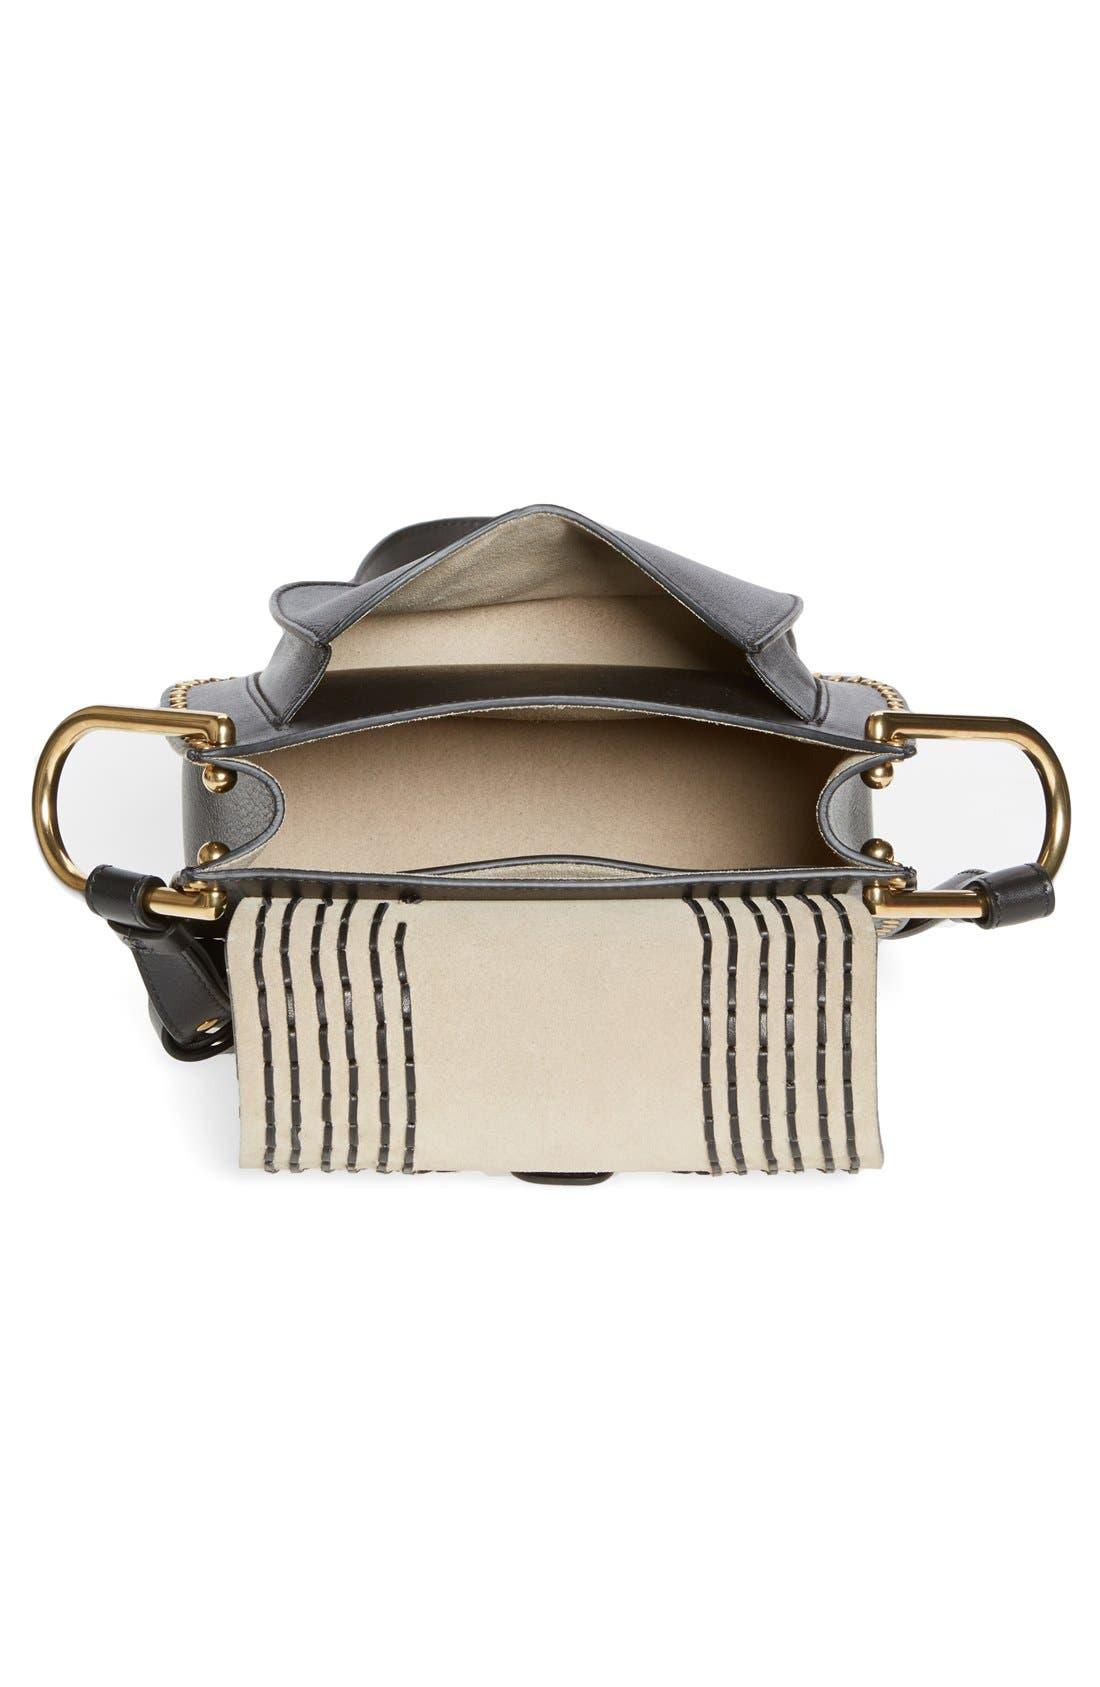 CHLOÉ,                             'Small Hudson' Studded Calfskin Leather Crossbody Bag,                             Alternate thumbnail 5, color,                             001